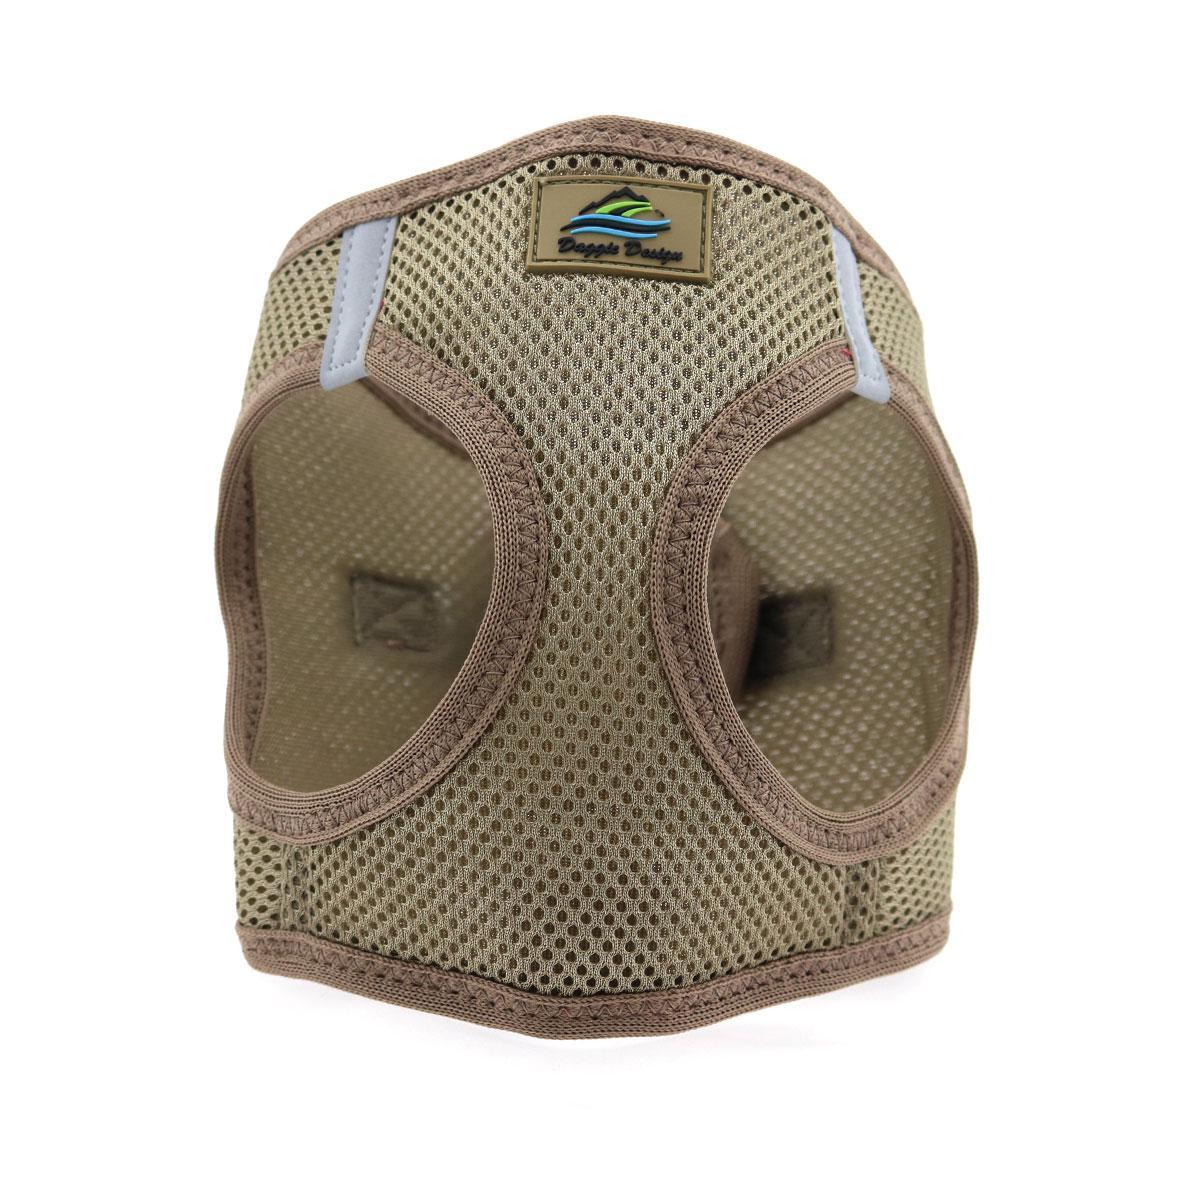 Doggie Design American River Choke-Free Dog Harness Solid, Fossil Brown, Medium